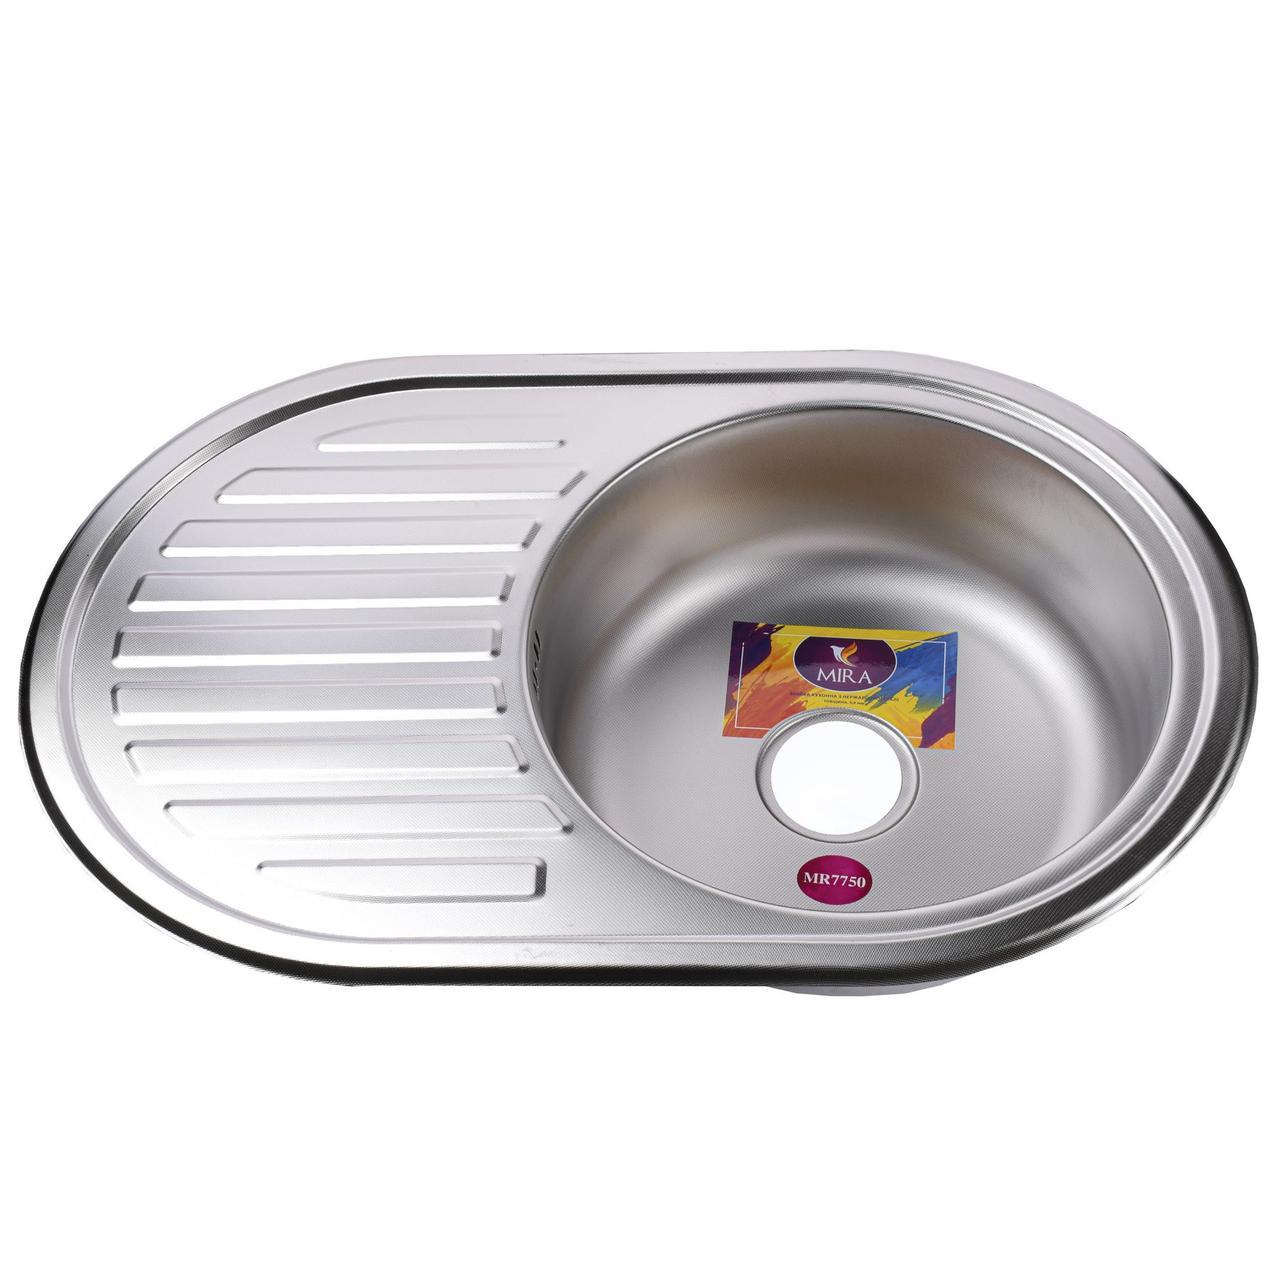 Мойка кухонная Mira MR 7750 D Decor